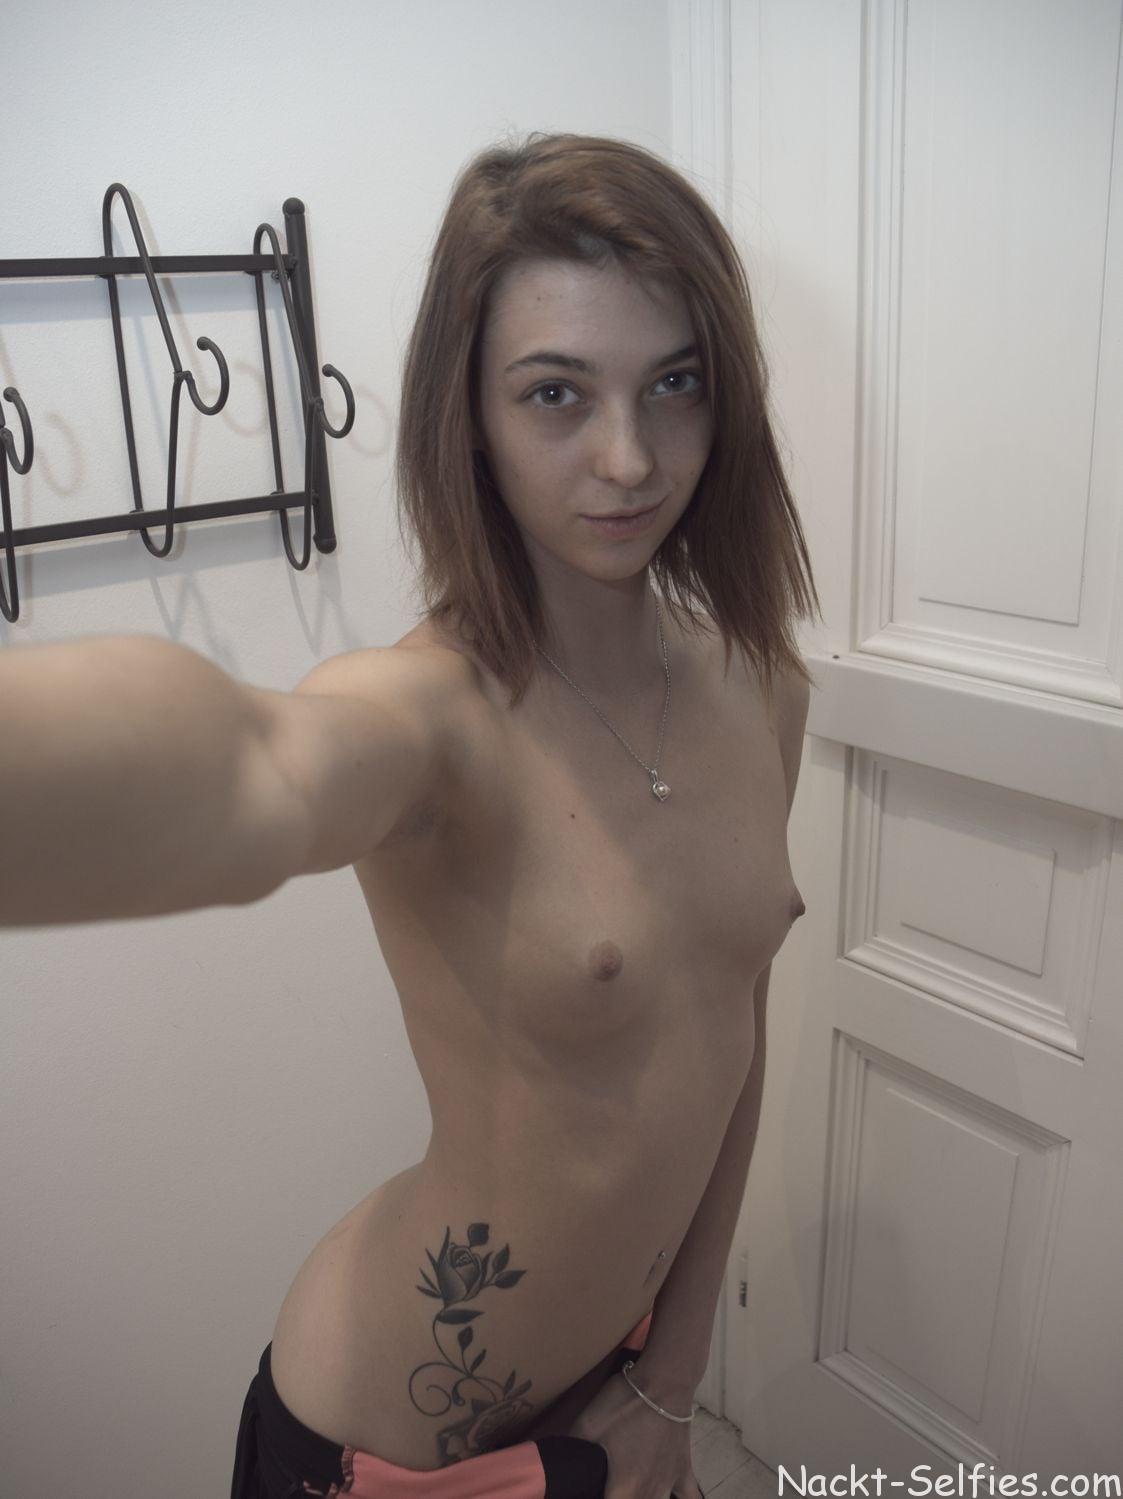 Geiles Nackt Selfie Anna-Lena 04